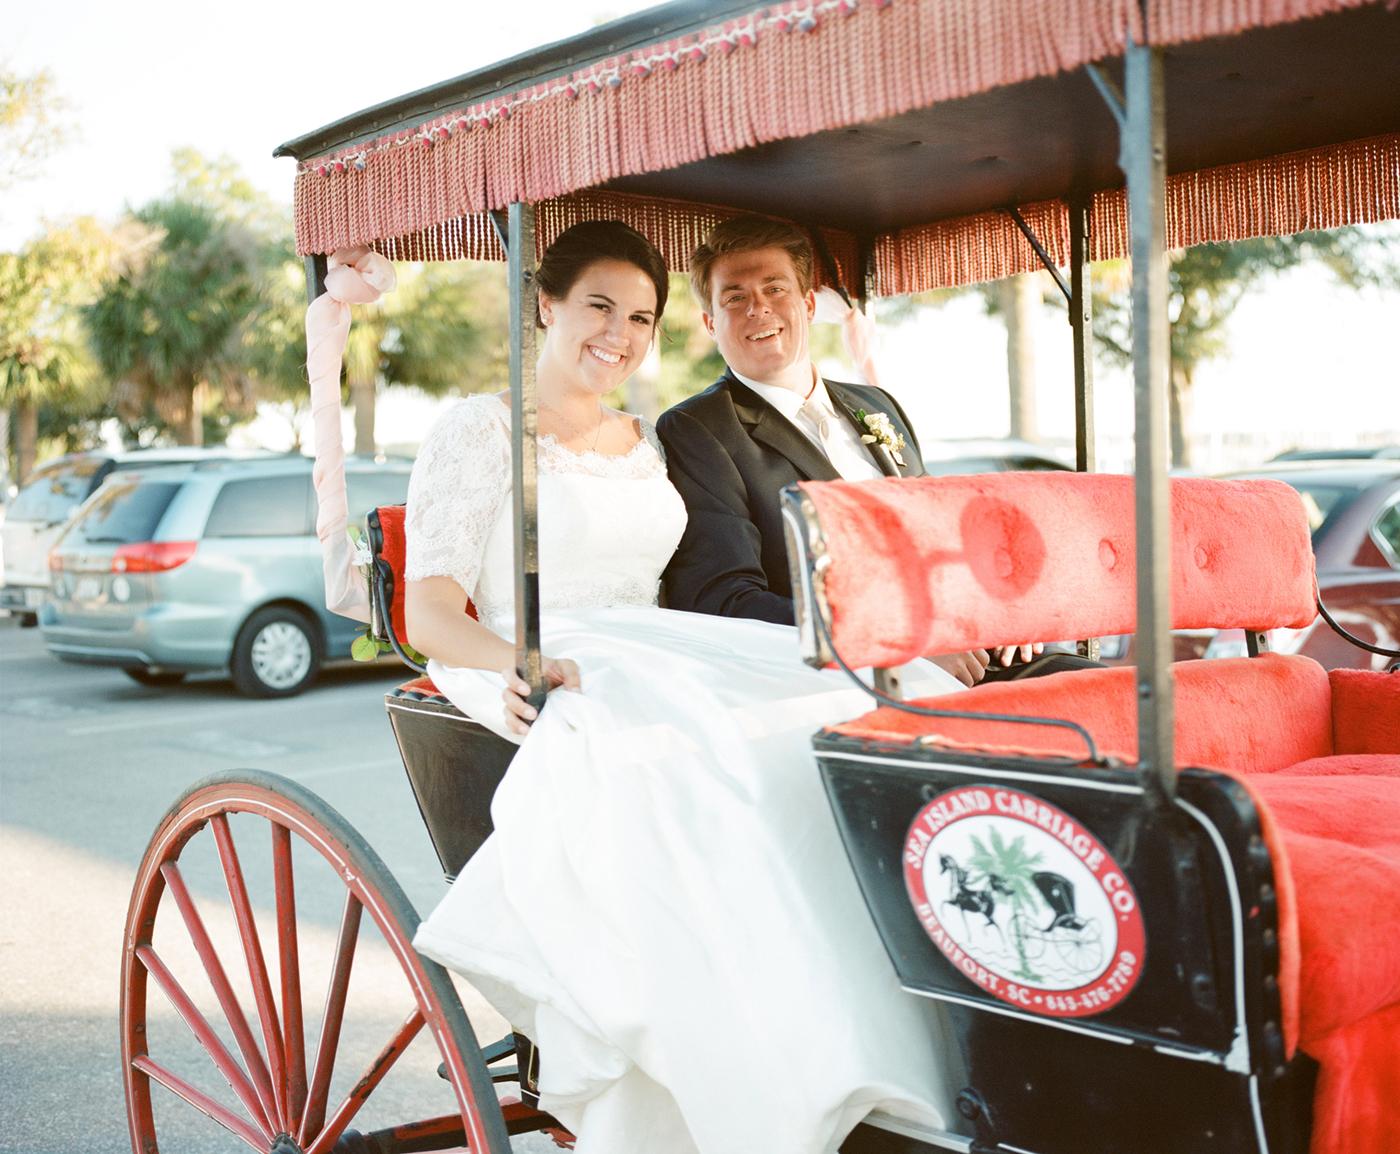 Bridget + Trent's Beaufort Inn wedding by Hilton Head vendor Kim Box Photography - A Lowcountry Wedding Magazine